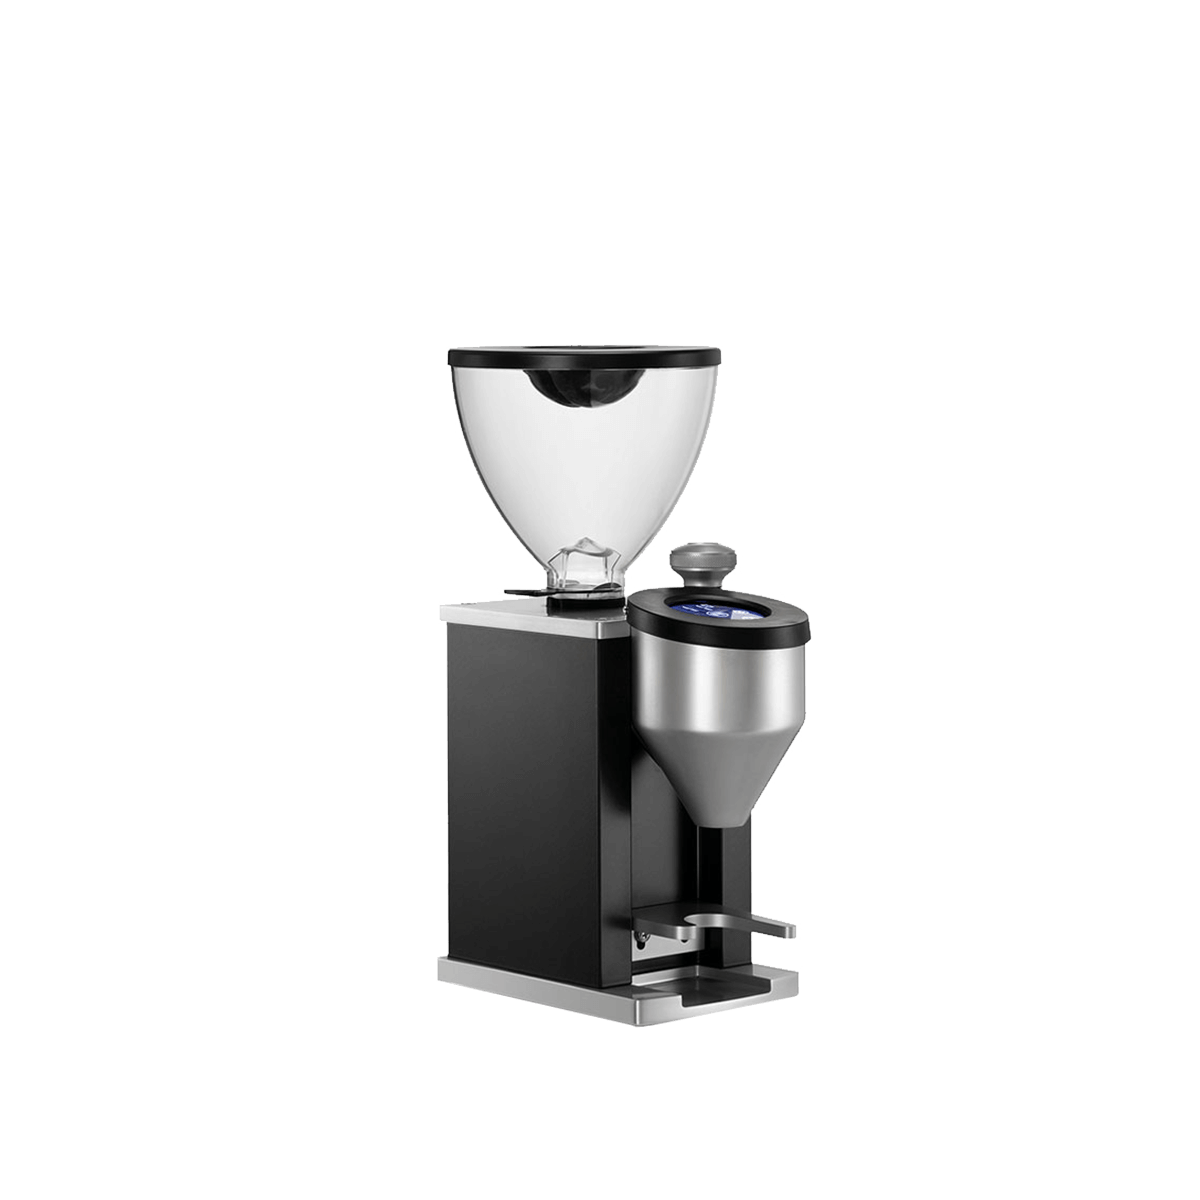 Coffee Grinder – Rocket Espresso Faustino Mat Black